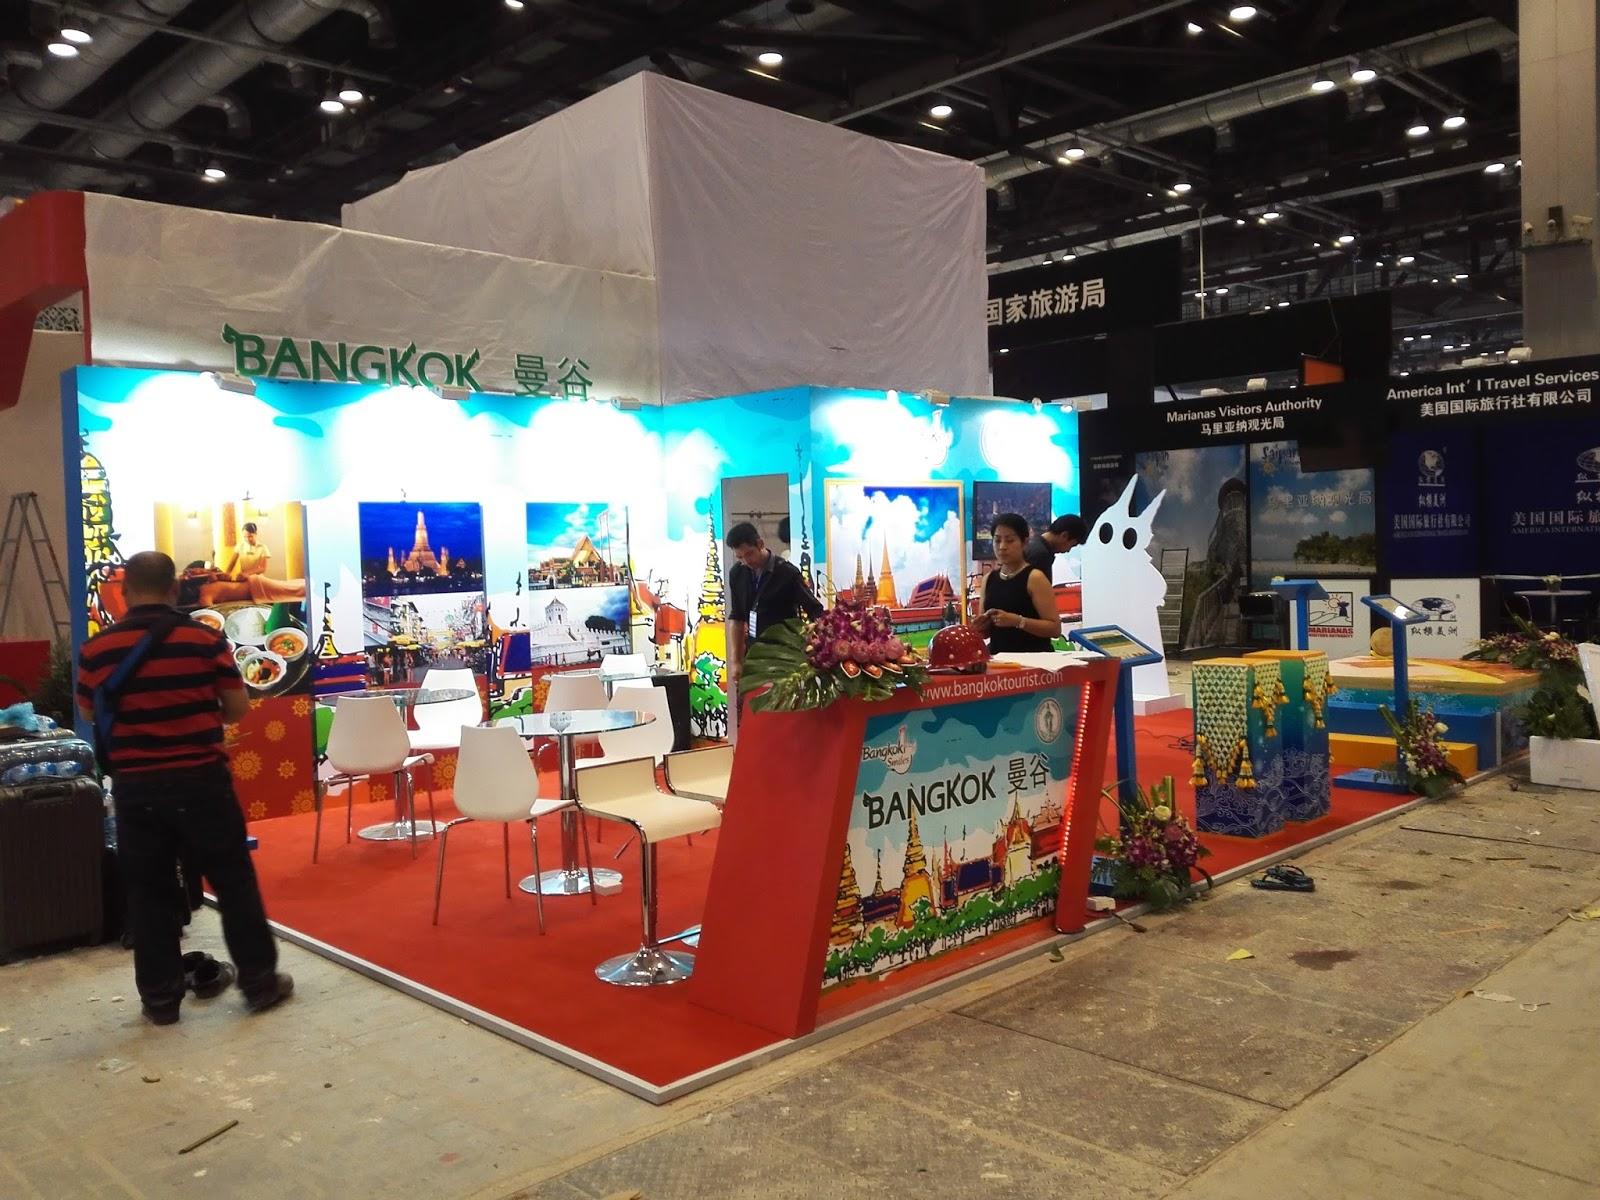 Exhibition Stand Builders Bangkok : Trade exhibition custom exhibit company yoho expo yoho expo